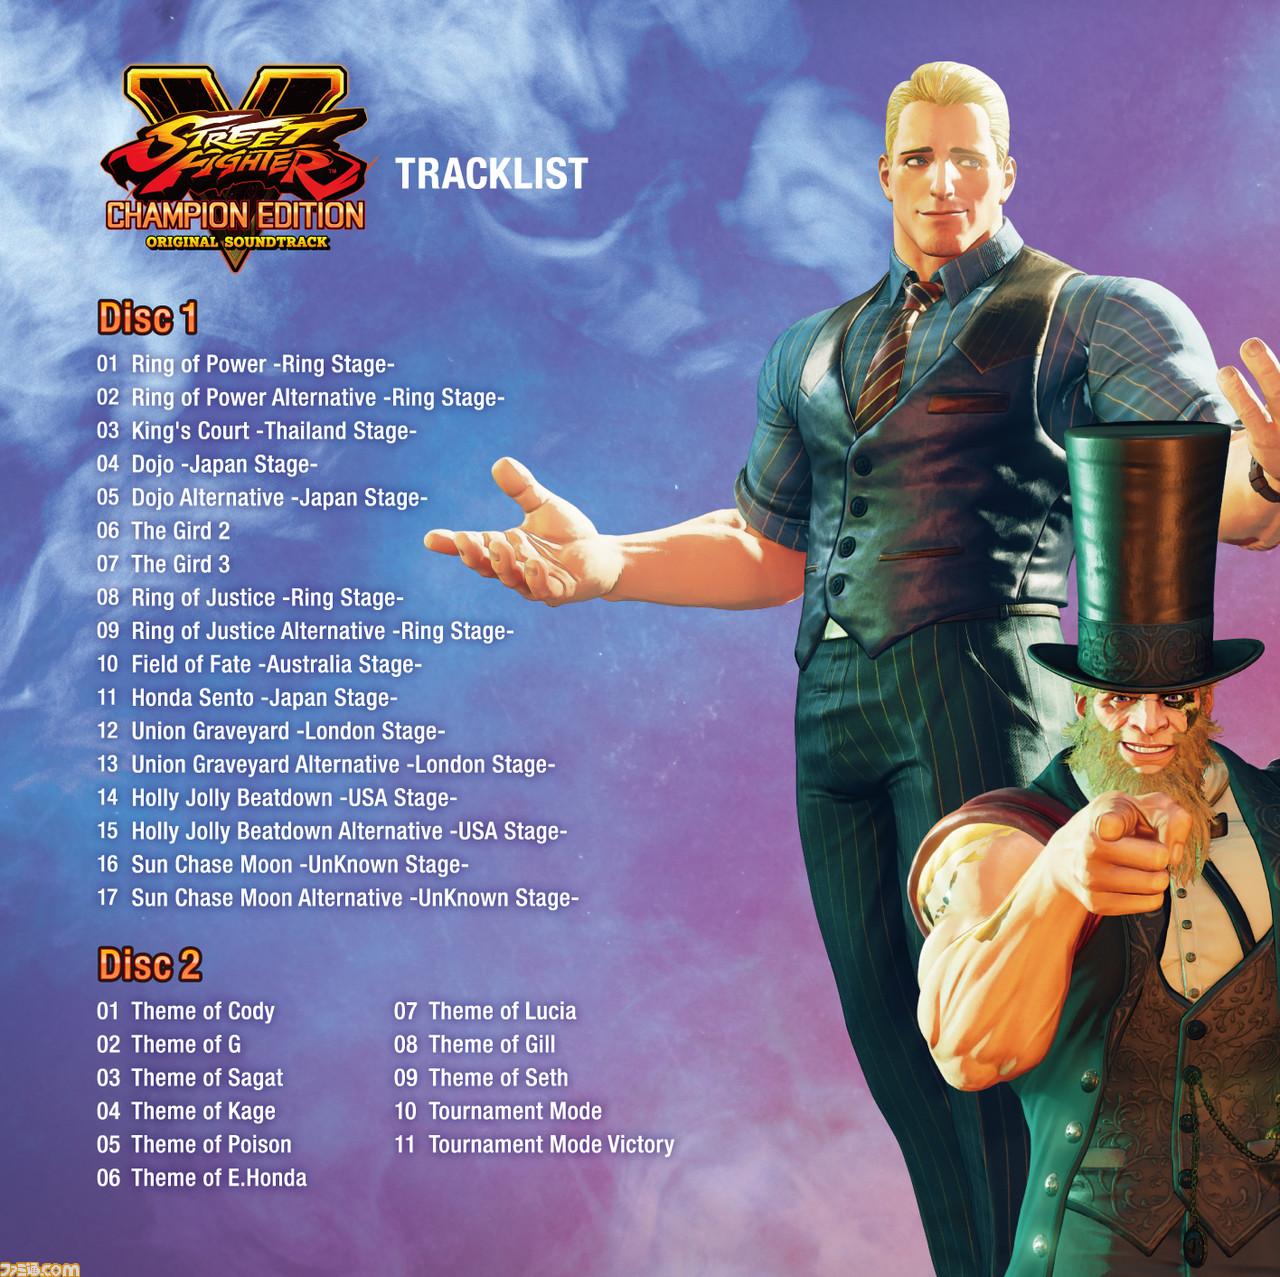 Street Fighter V Champion Edition Original Soundtrack Tracklist